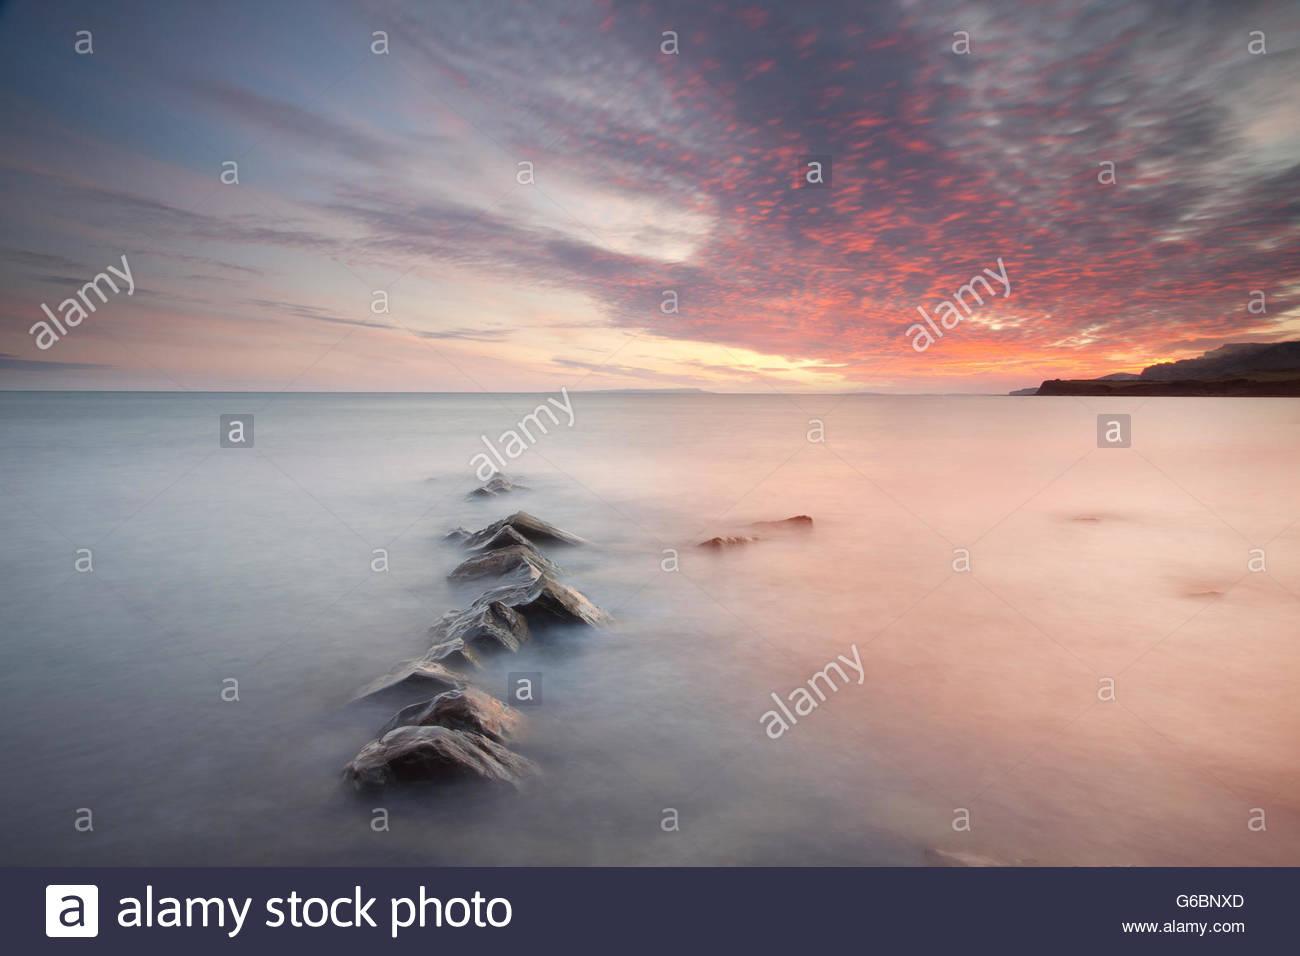 Rocks protruding through a gentle sea. - Stock Image